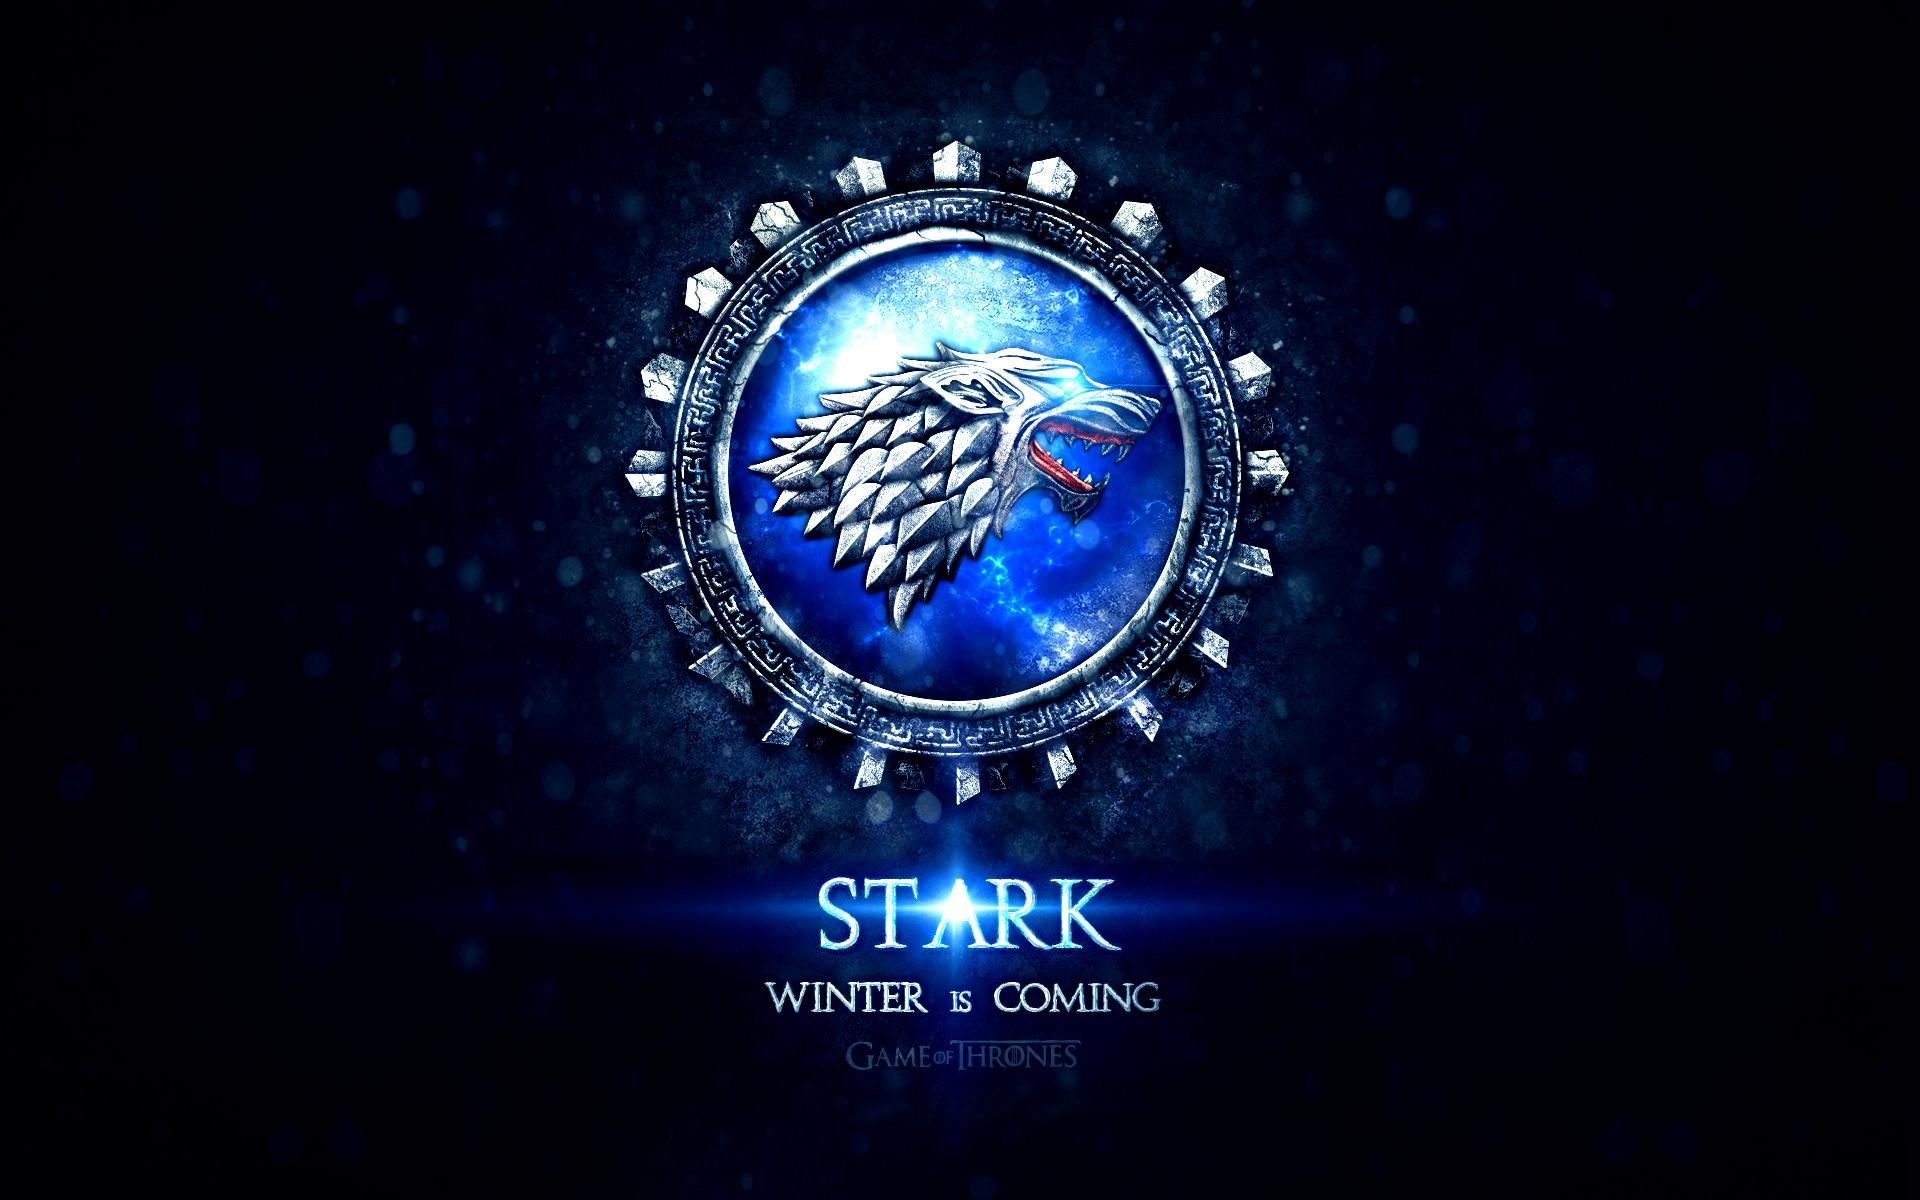 Game of Thrones Stark Wallpaper .